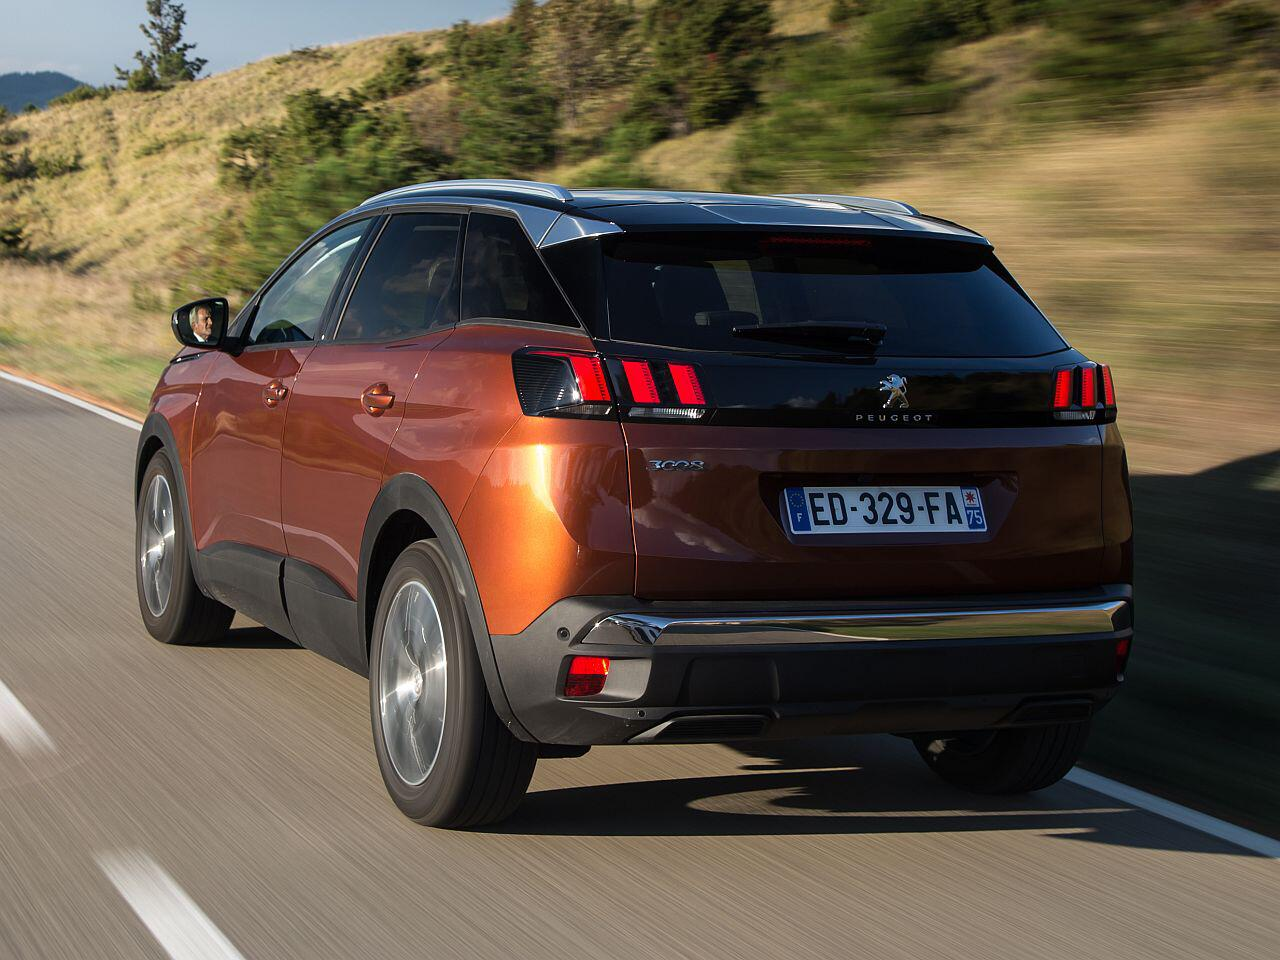 Bild zu Tops: Peugeot